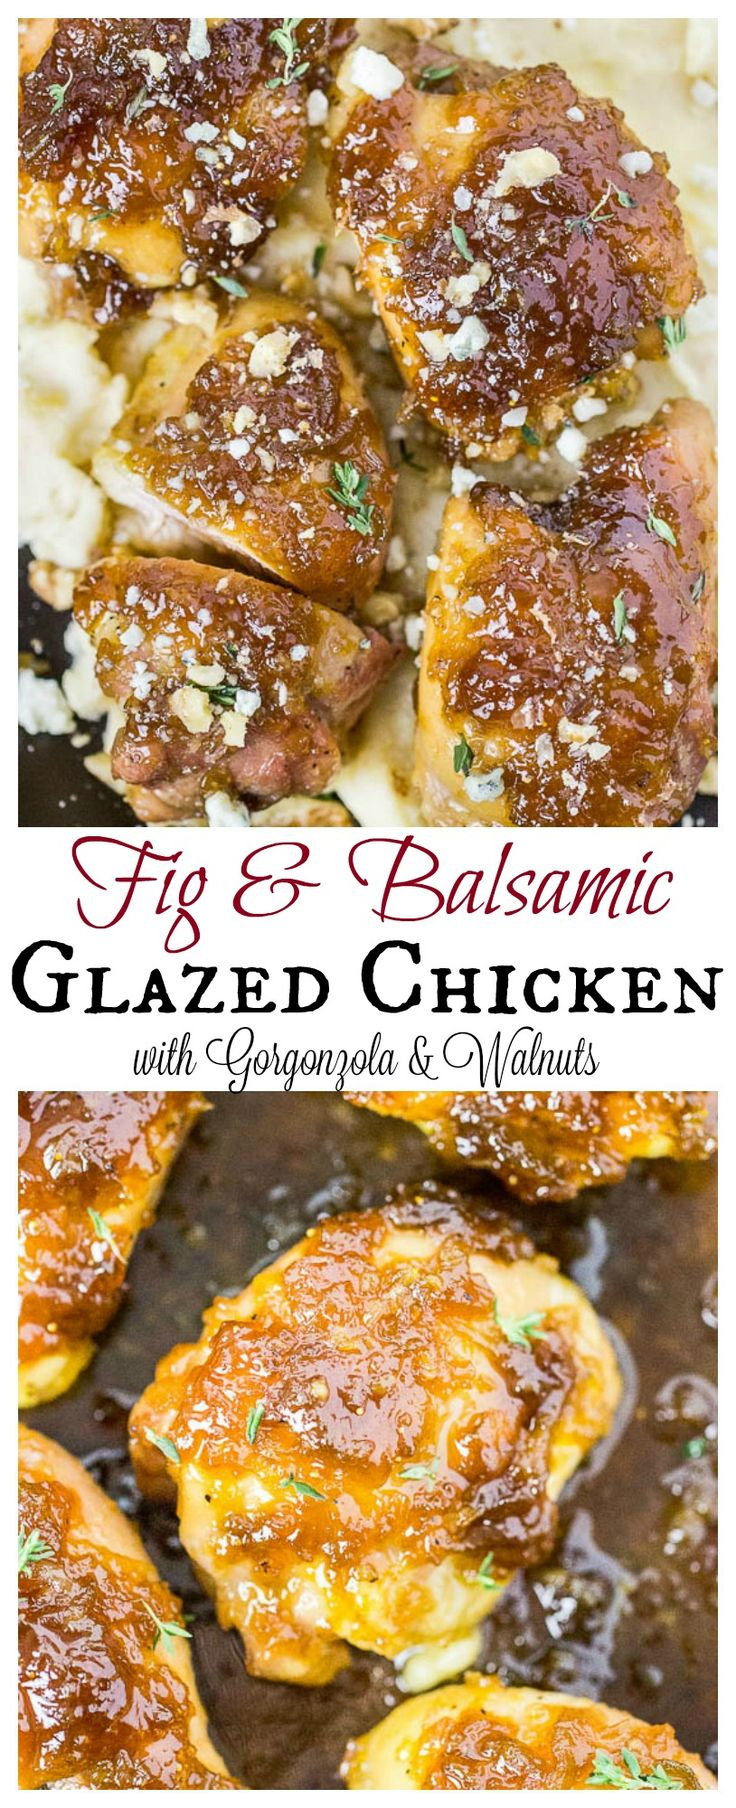 Fig & Balsamic Glazed Chicken Thighs with Gorgonzola, Thyme & Walnuts.